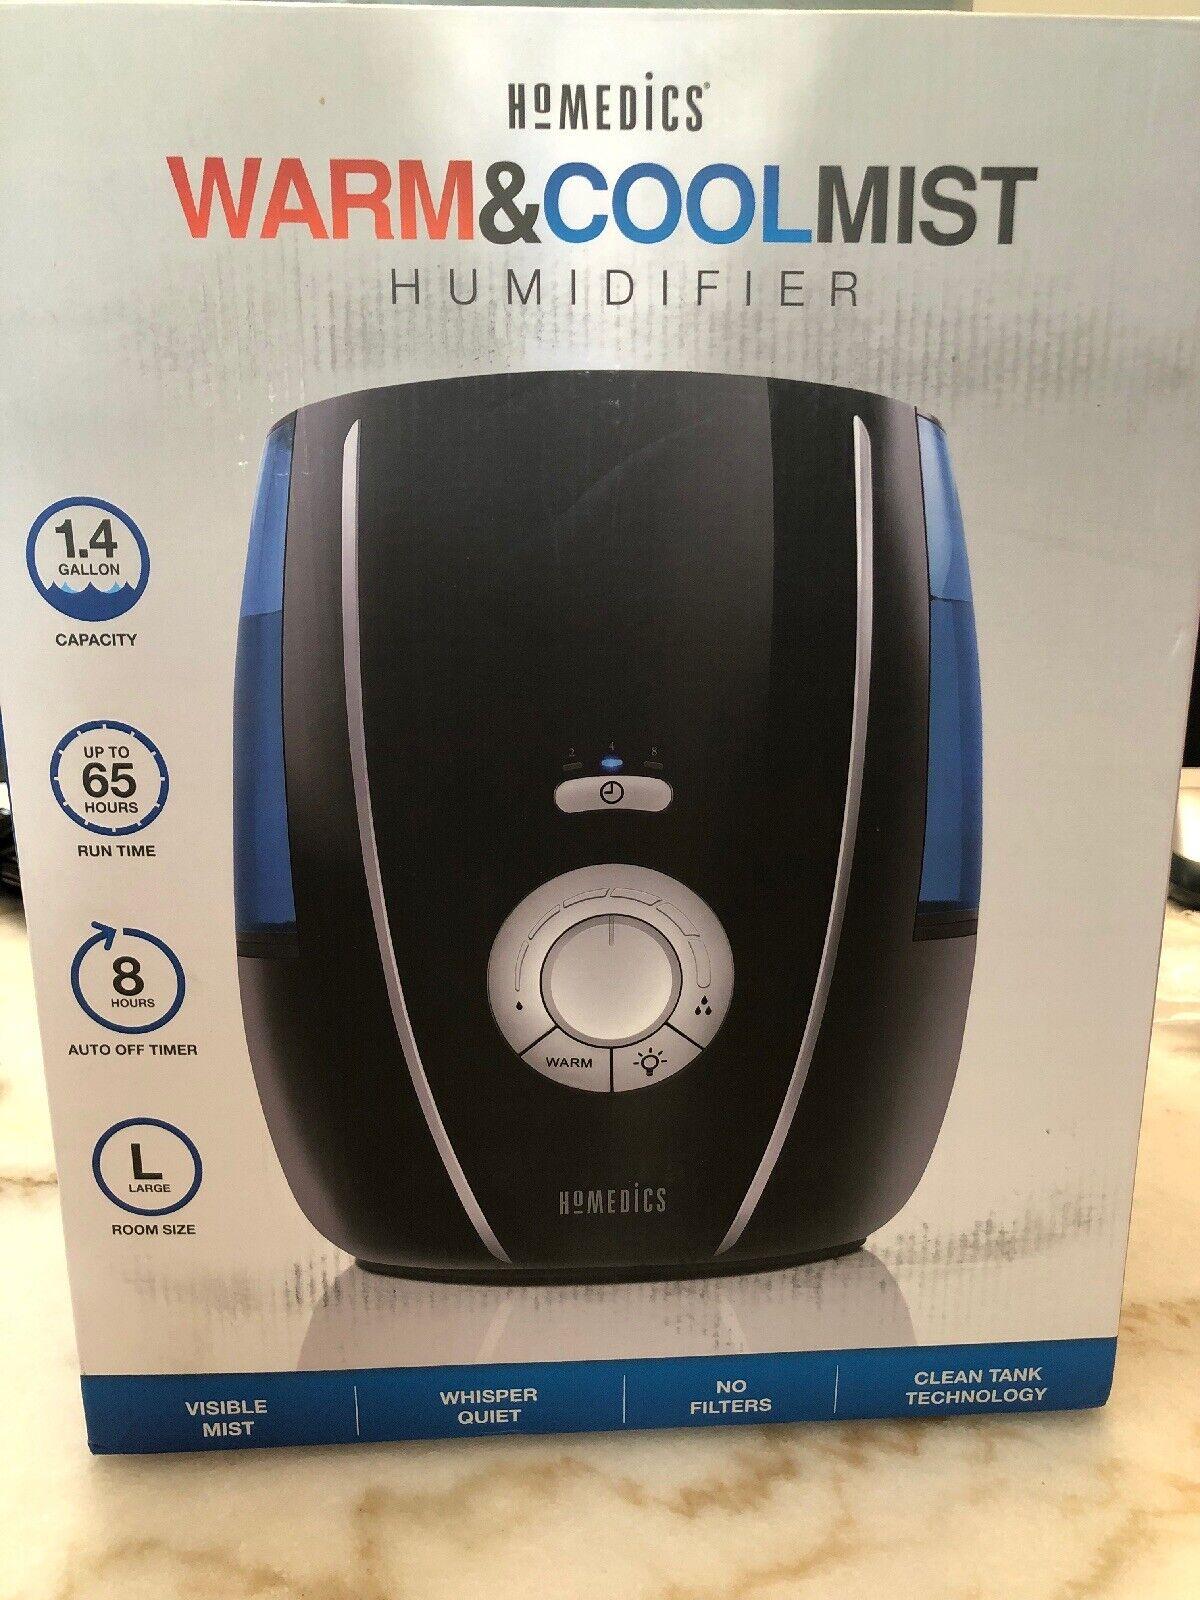 HoMedics Warm & Cold Mist Humidifier, UHE WM80 1.4 gallon